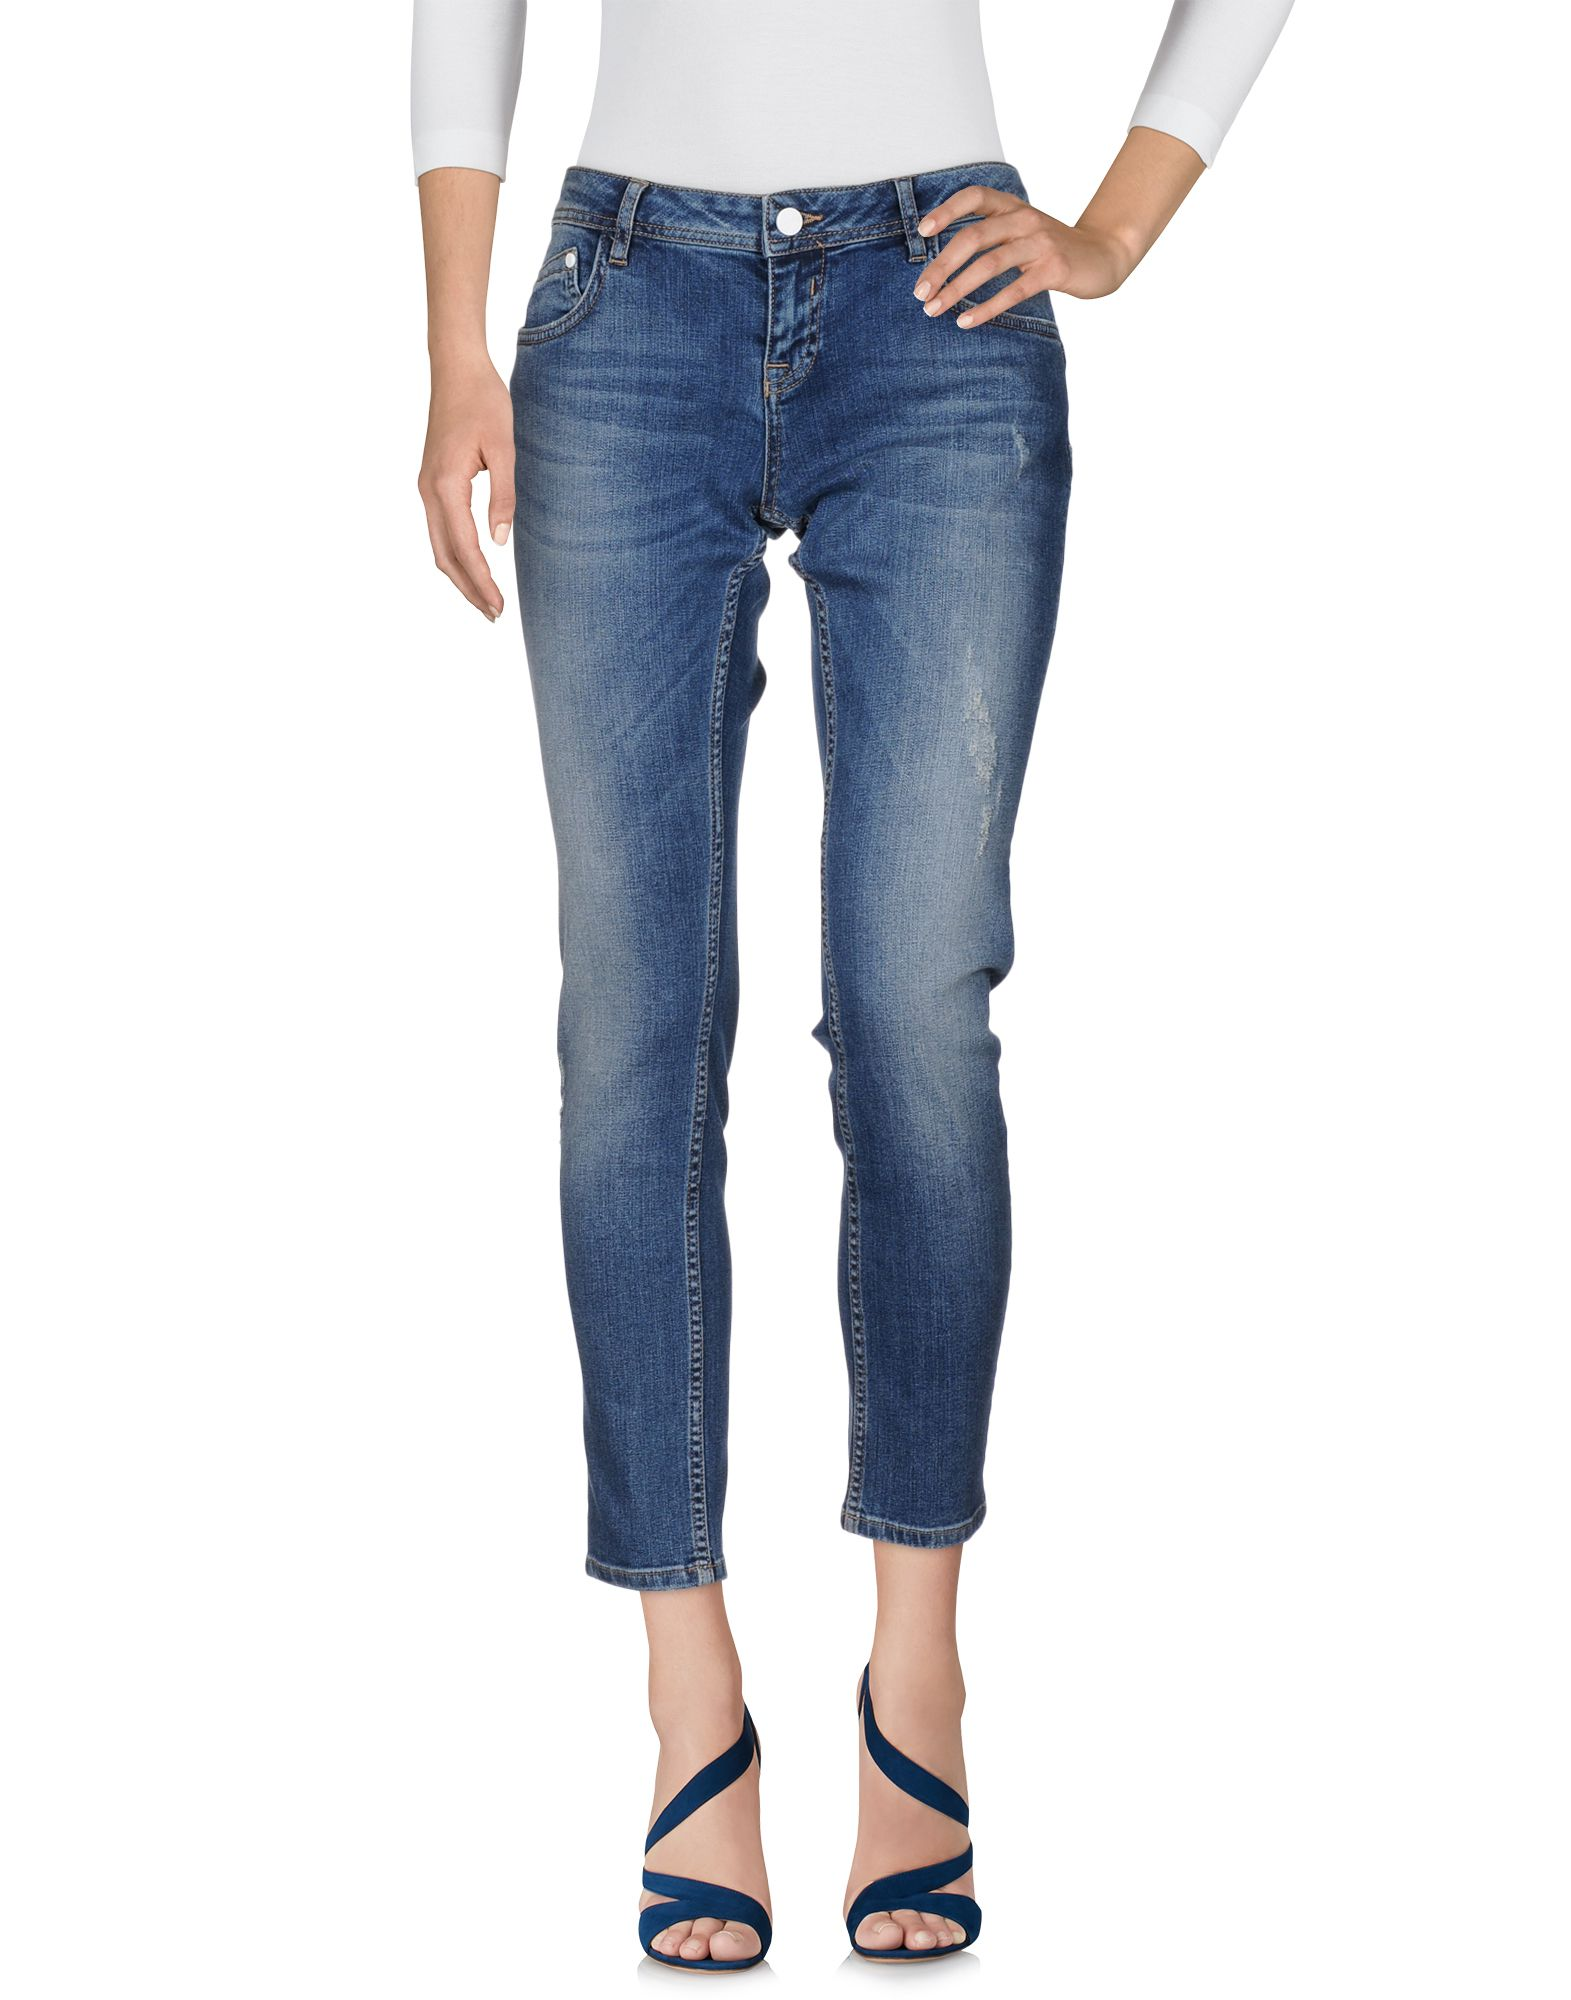 Pantaloni Jeans Iceberg Donna - Acquista online su uWRkeIjp